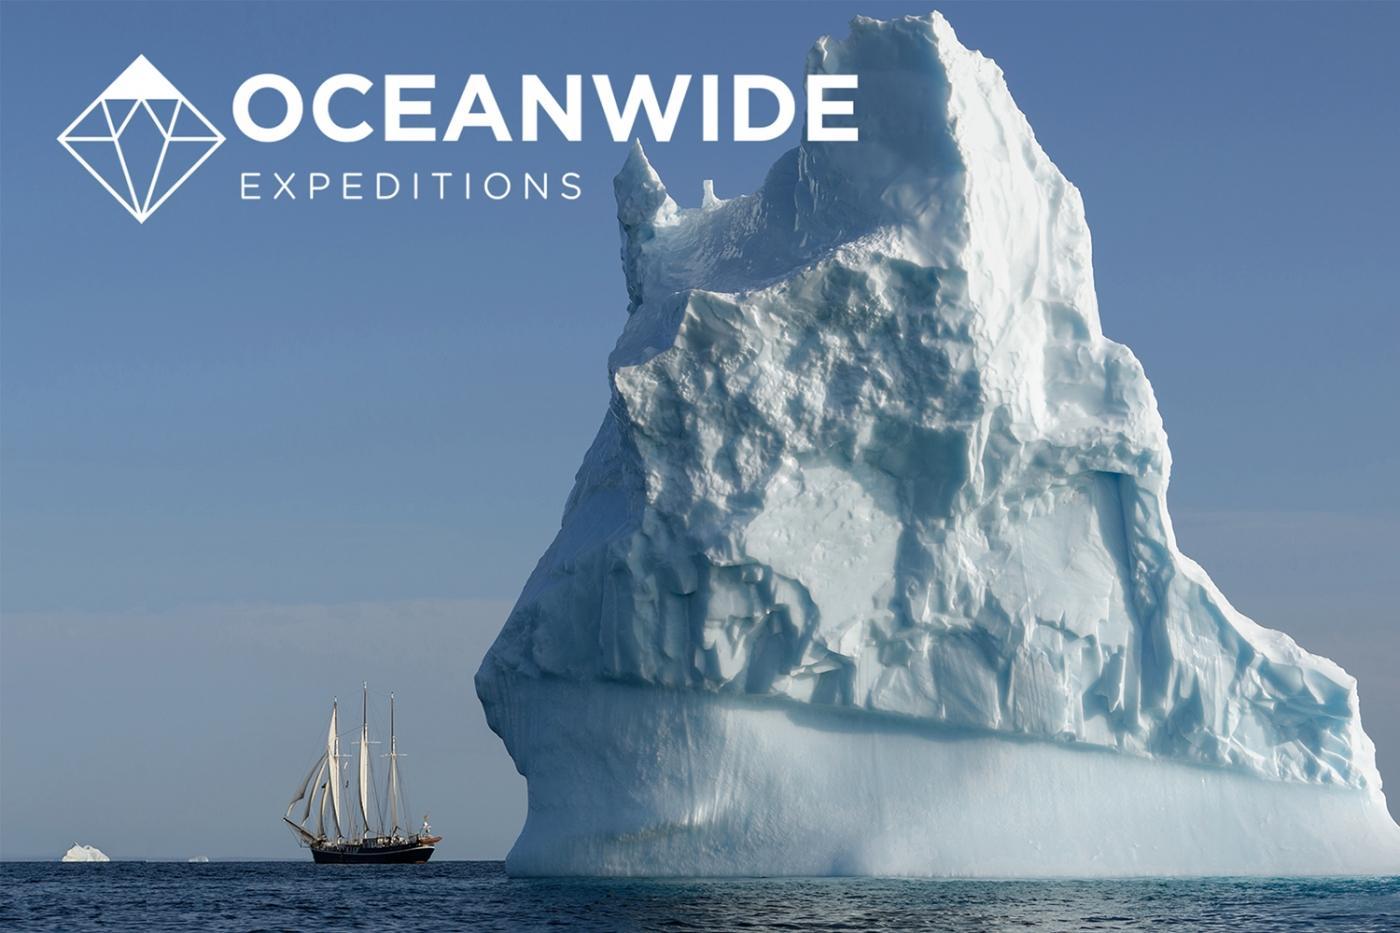 Oceanwide Expeditions – Spitsbergen to Northeast Greenland